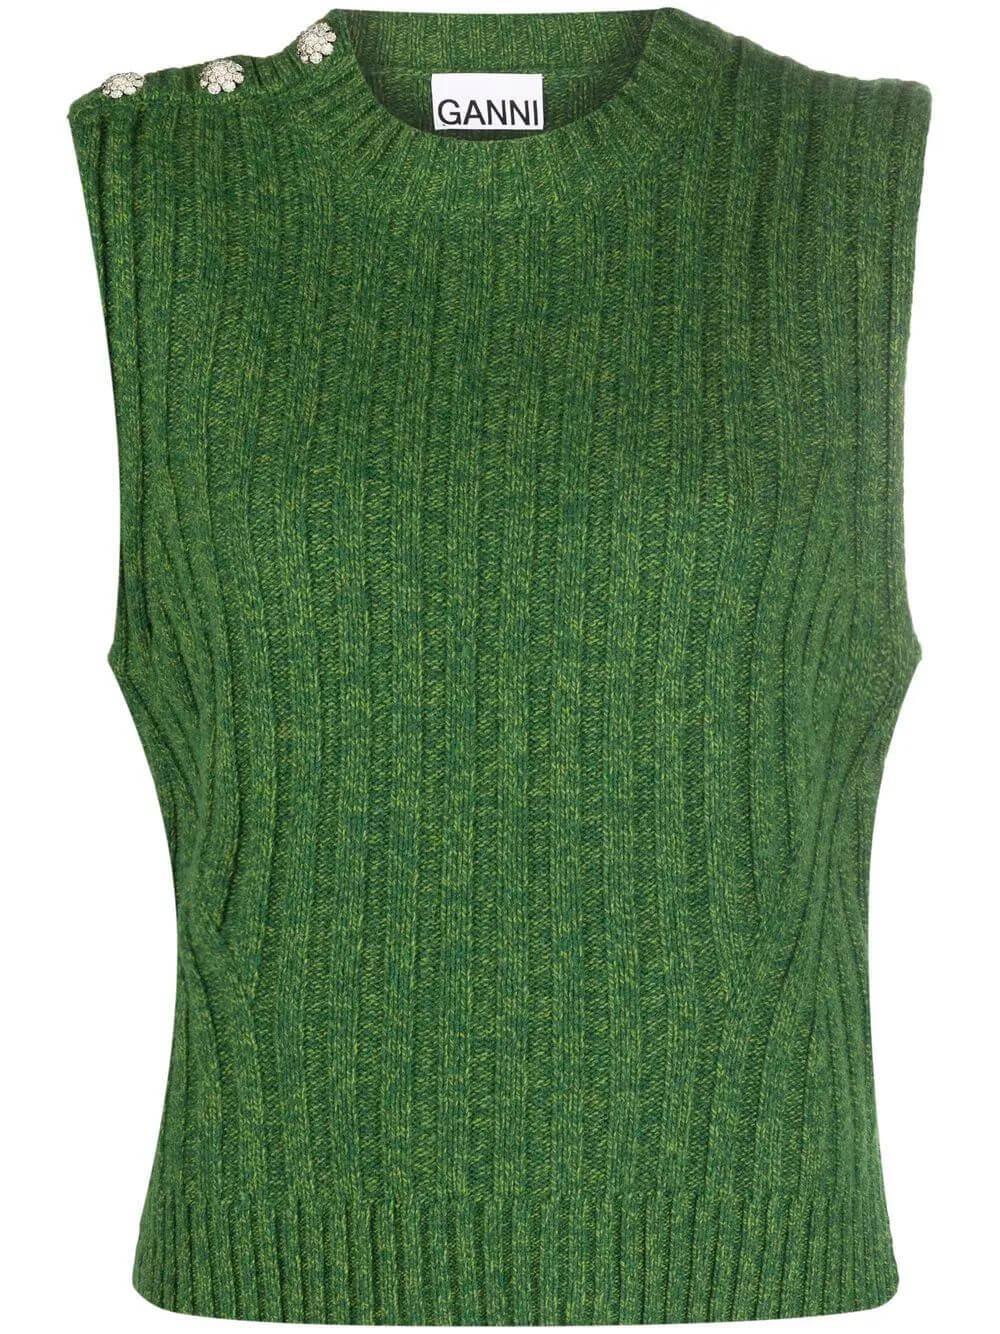 Wool Mix Sweater Vest